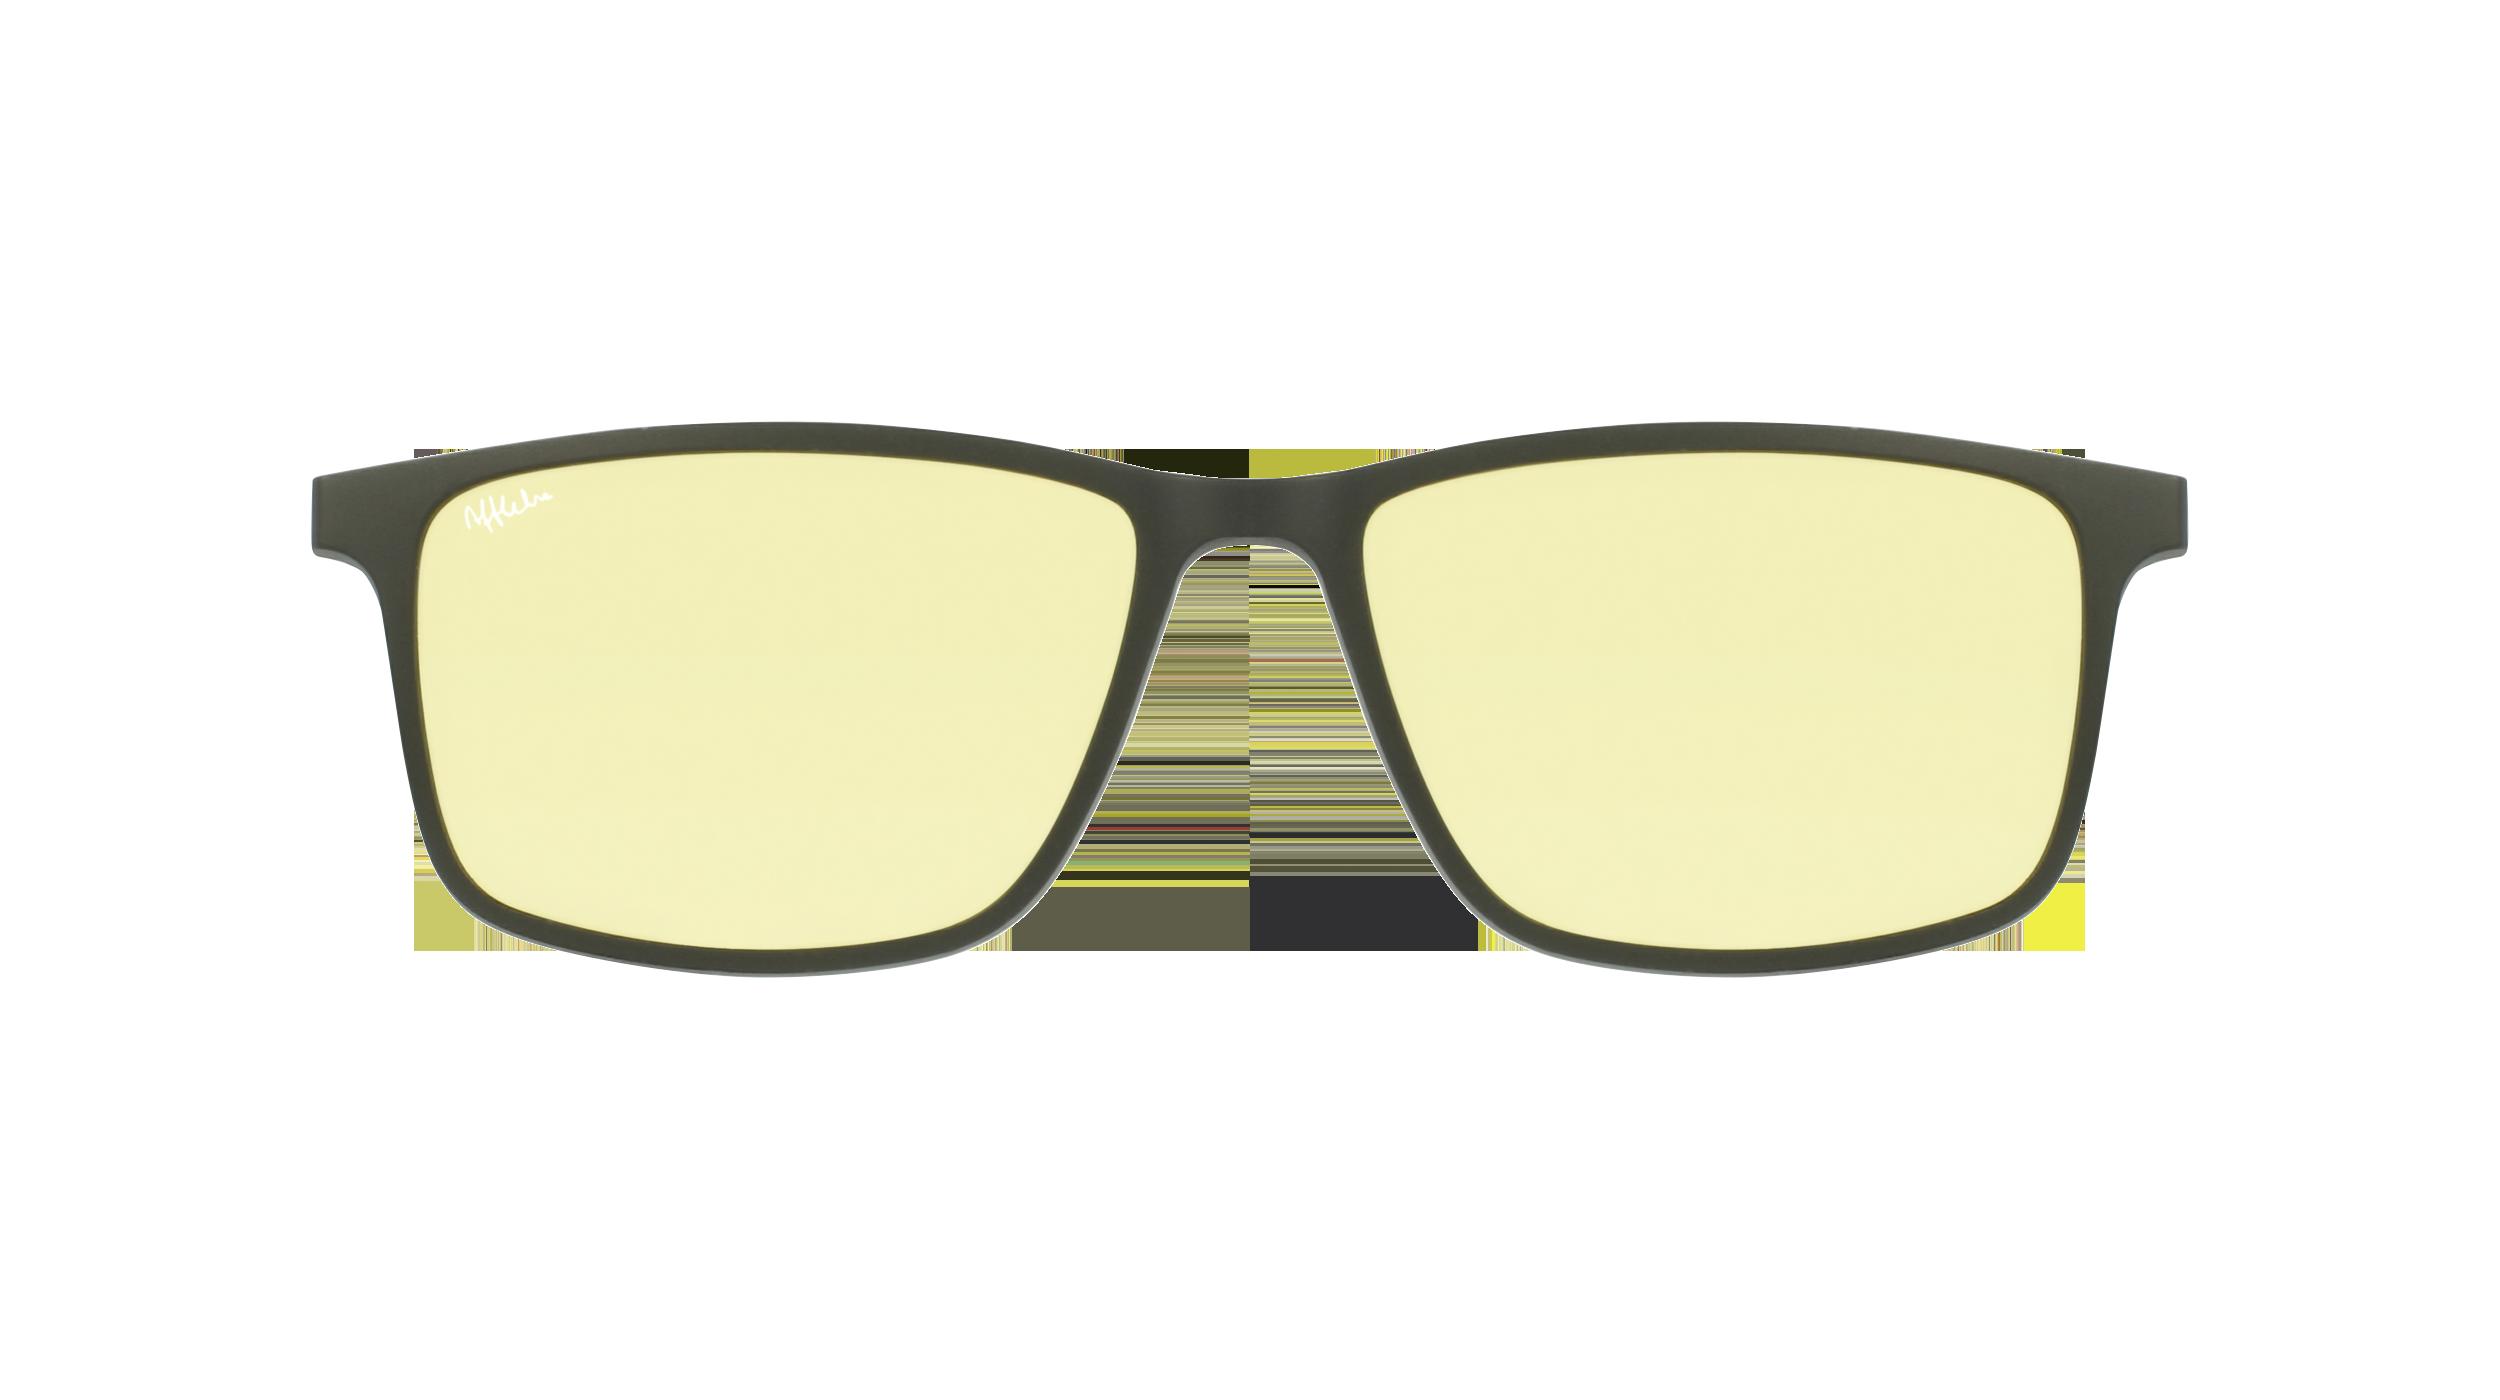 afflelou/france/products/smart_clip/clips_glasses/07630036457078.png